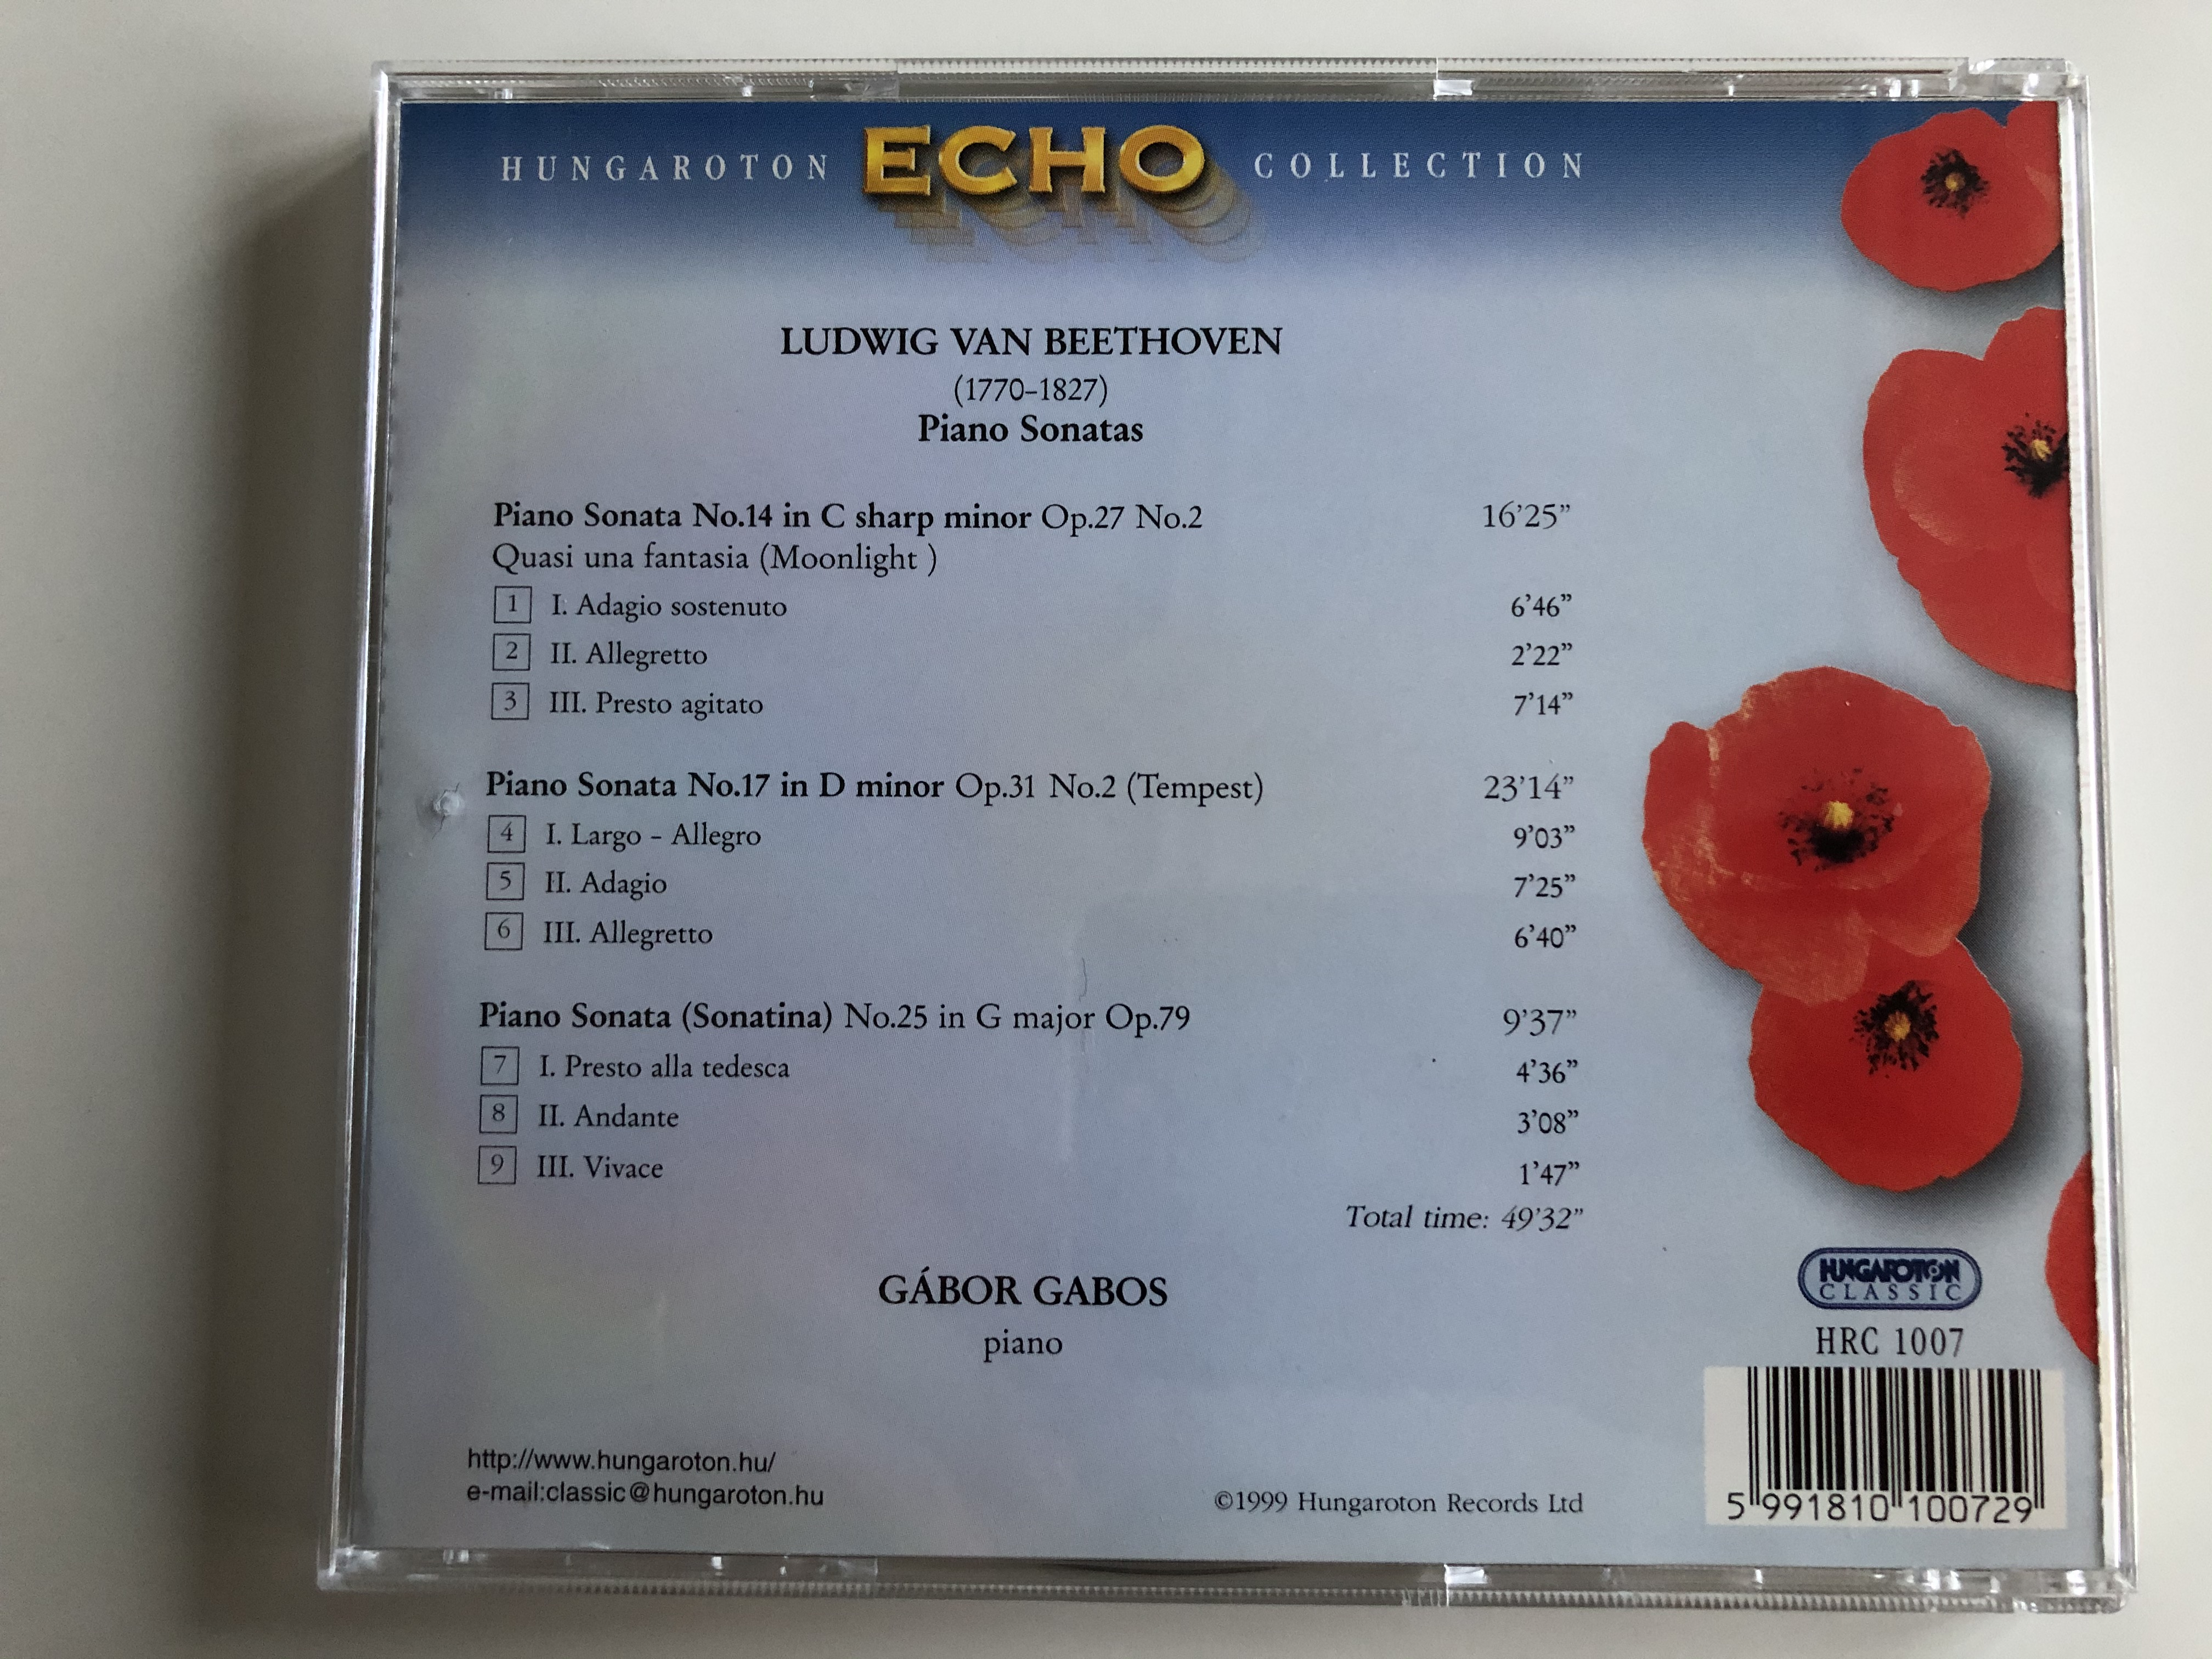 beethoven-piano-sonatas-moonlight-op.-272-tempest-op.-312-g-major-op.79-g-bor-gabos-hungaroton-classic-audio-cd-1962-stereo-hrc-1007-4-.jpg